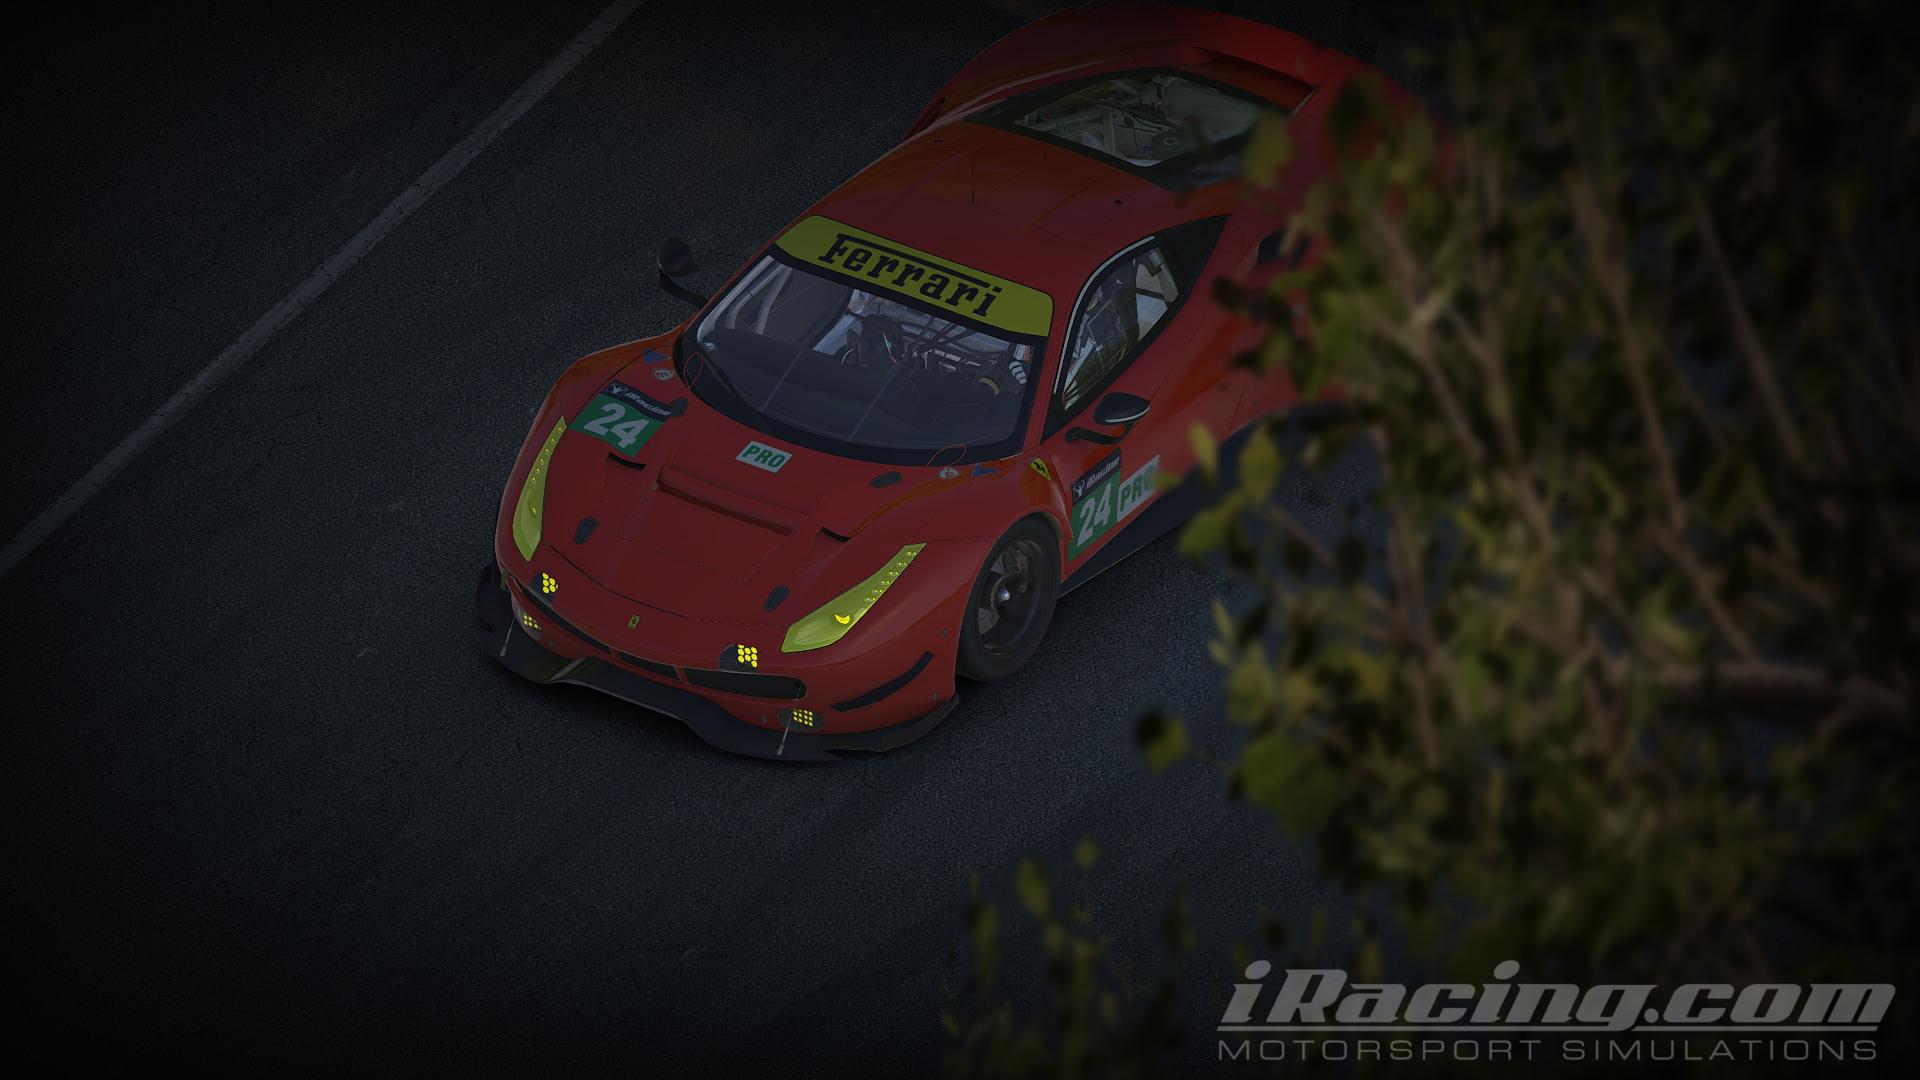 iRacing Ferrari 488 GTE First Look - Inside Sim Racing